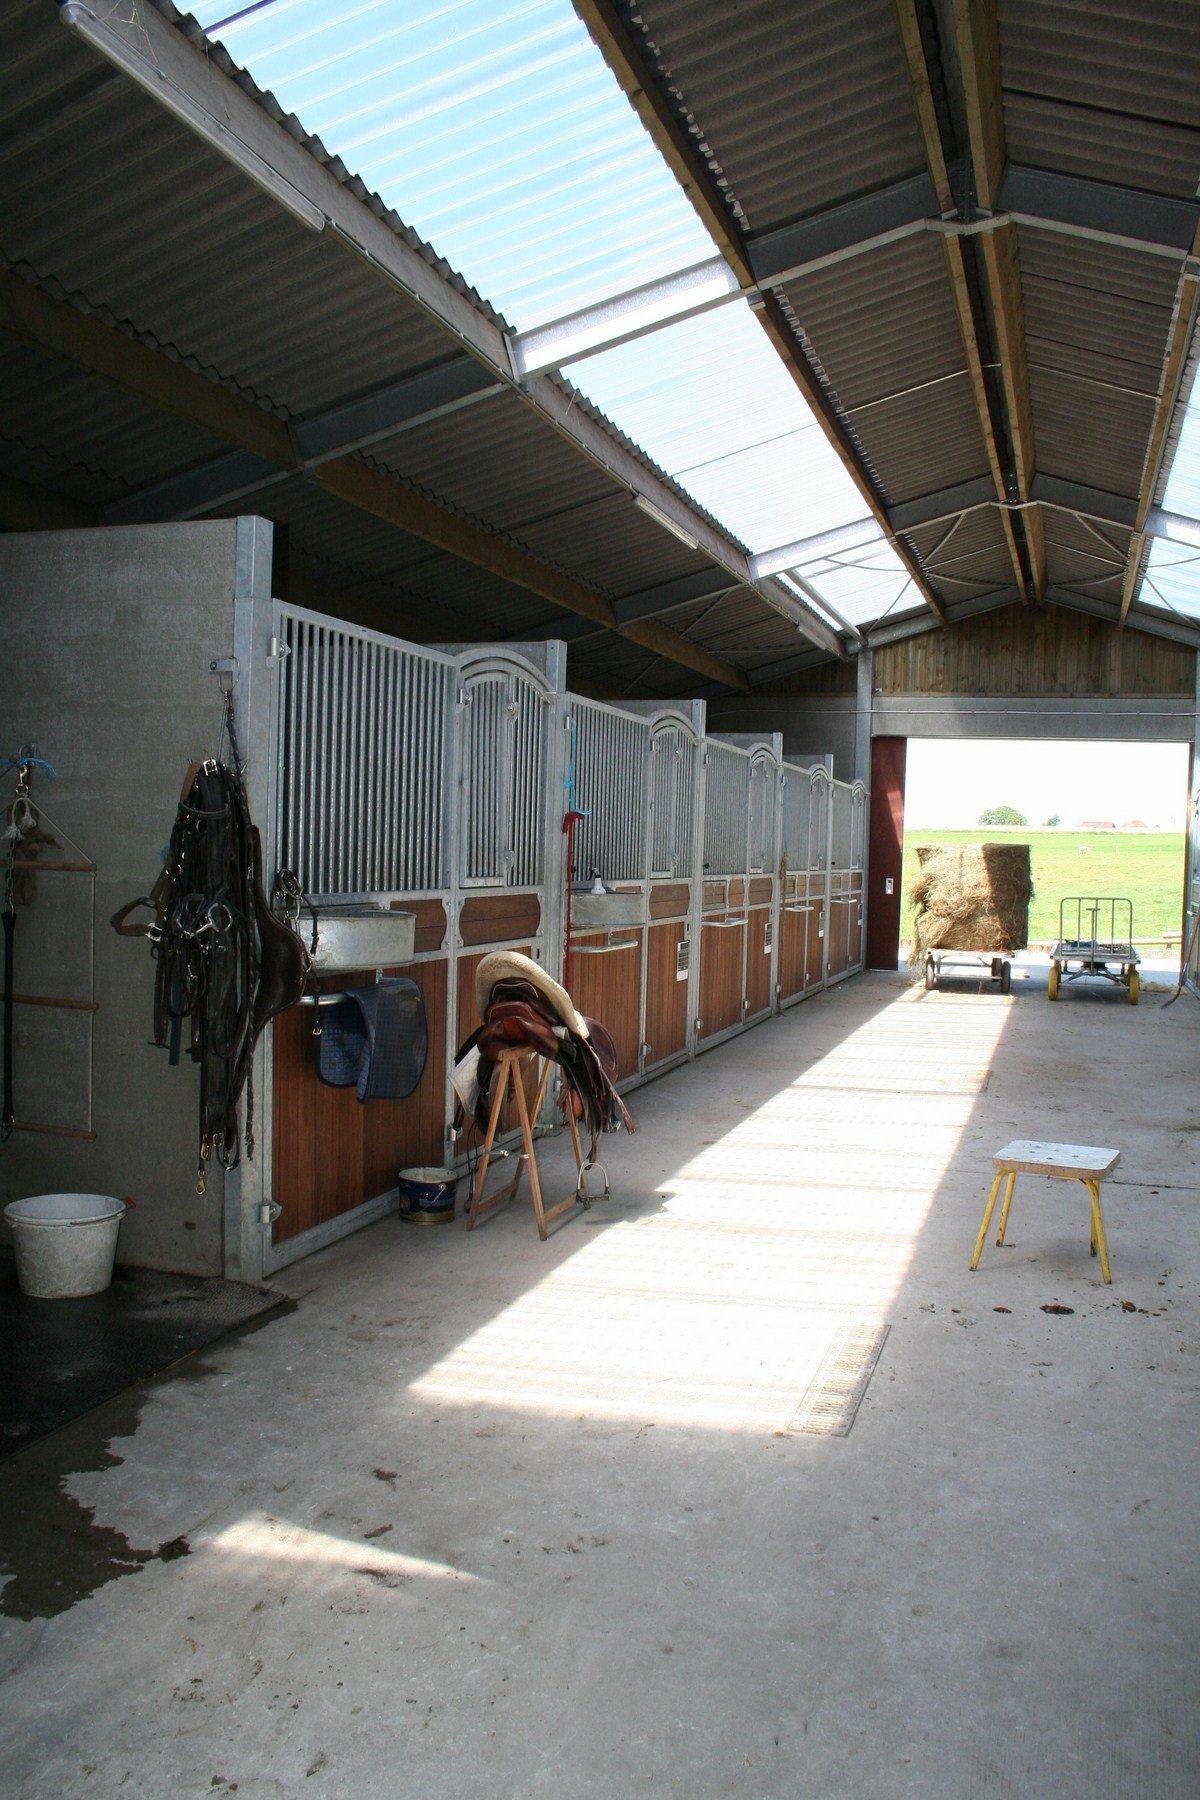 saint hermelle_paardenstallen_paardenboxen_binnenpiste_gouy les Pieton (18)